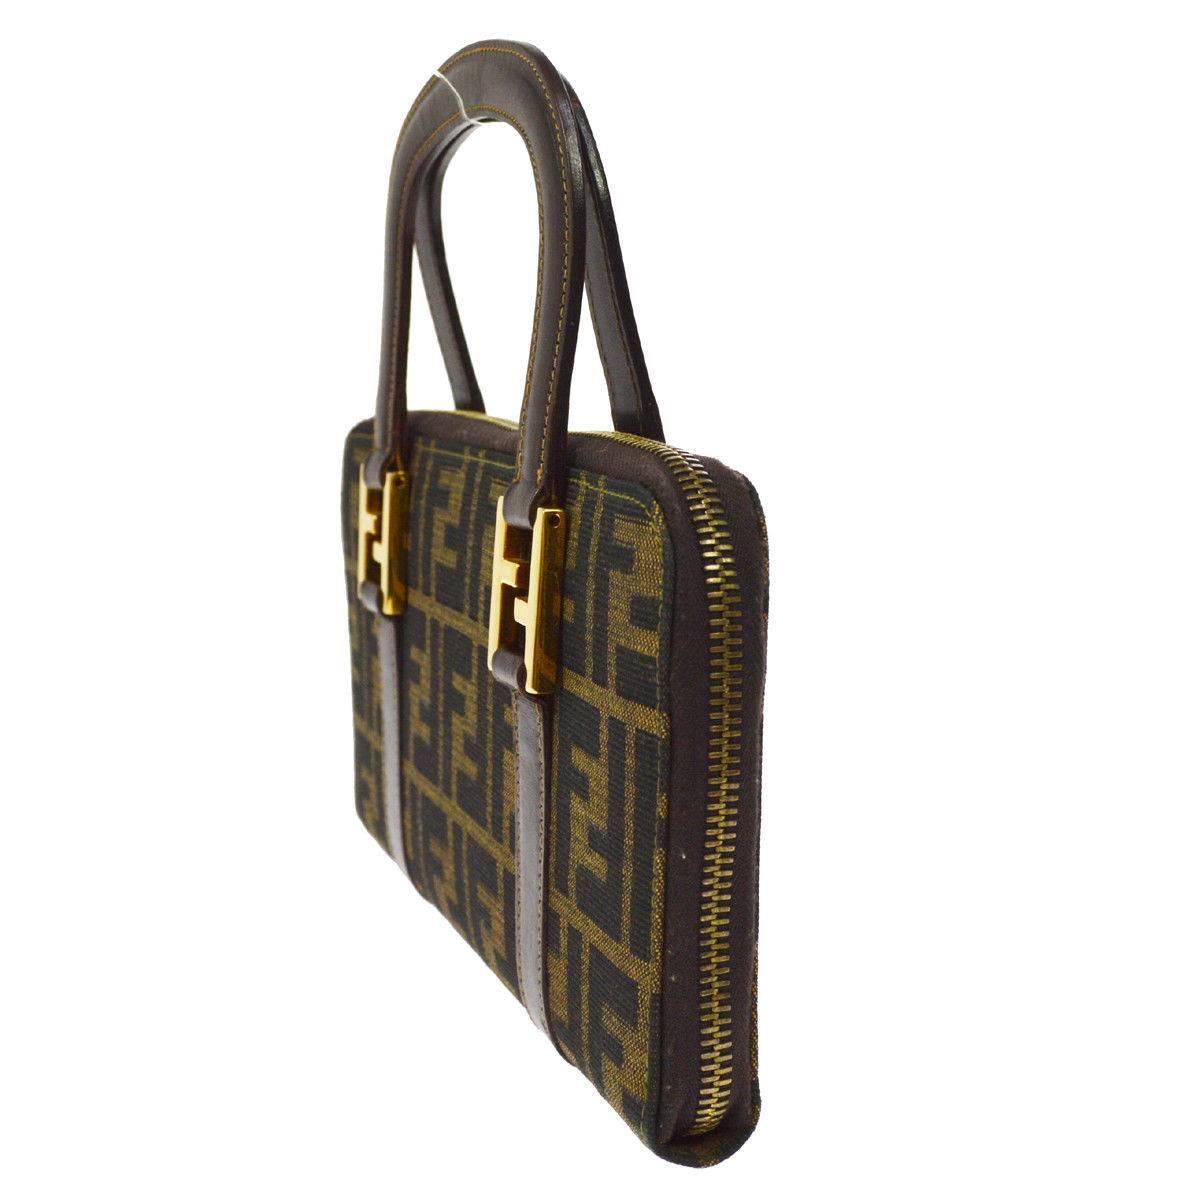 Fendi Monogram Canvas Logo Leather Round Evening Top Handle Satchel Bag NGbyCPAlO